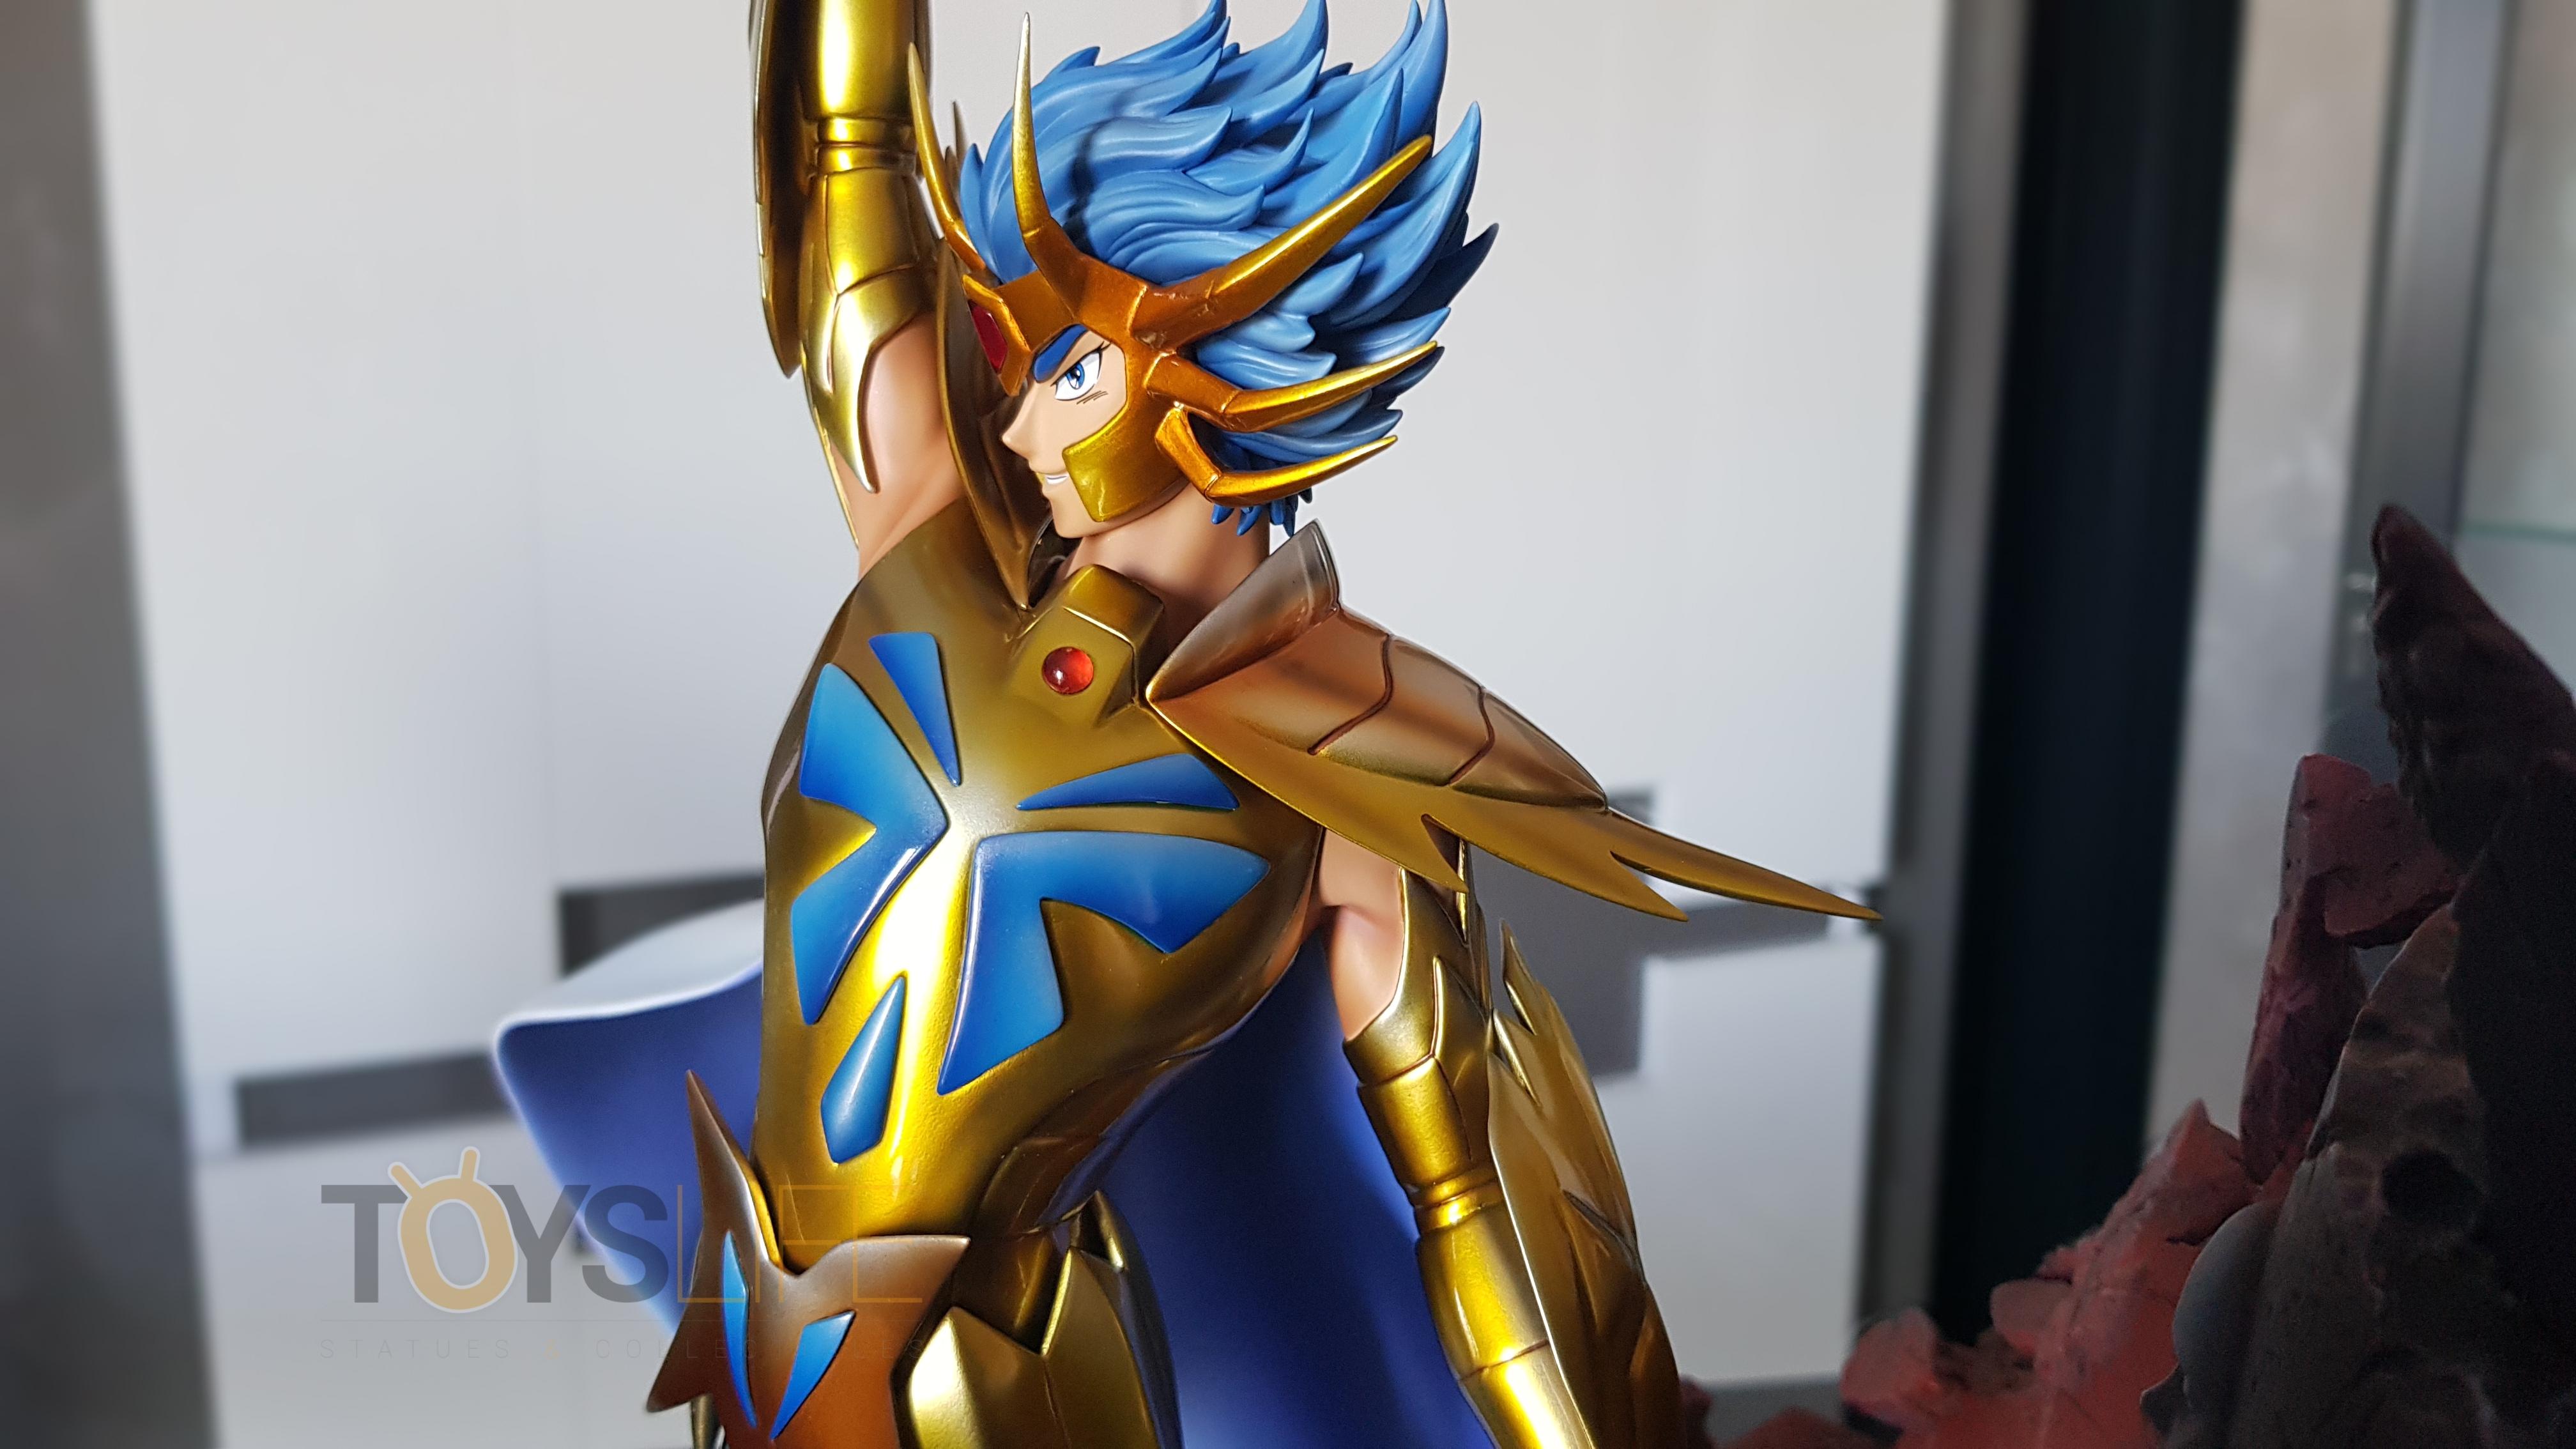 tsume-art-saint-seiya-gold-saint-death-mask-statue-toyslife-review-33